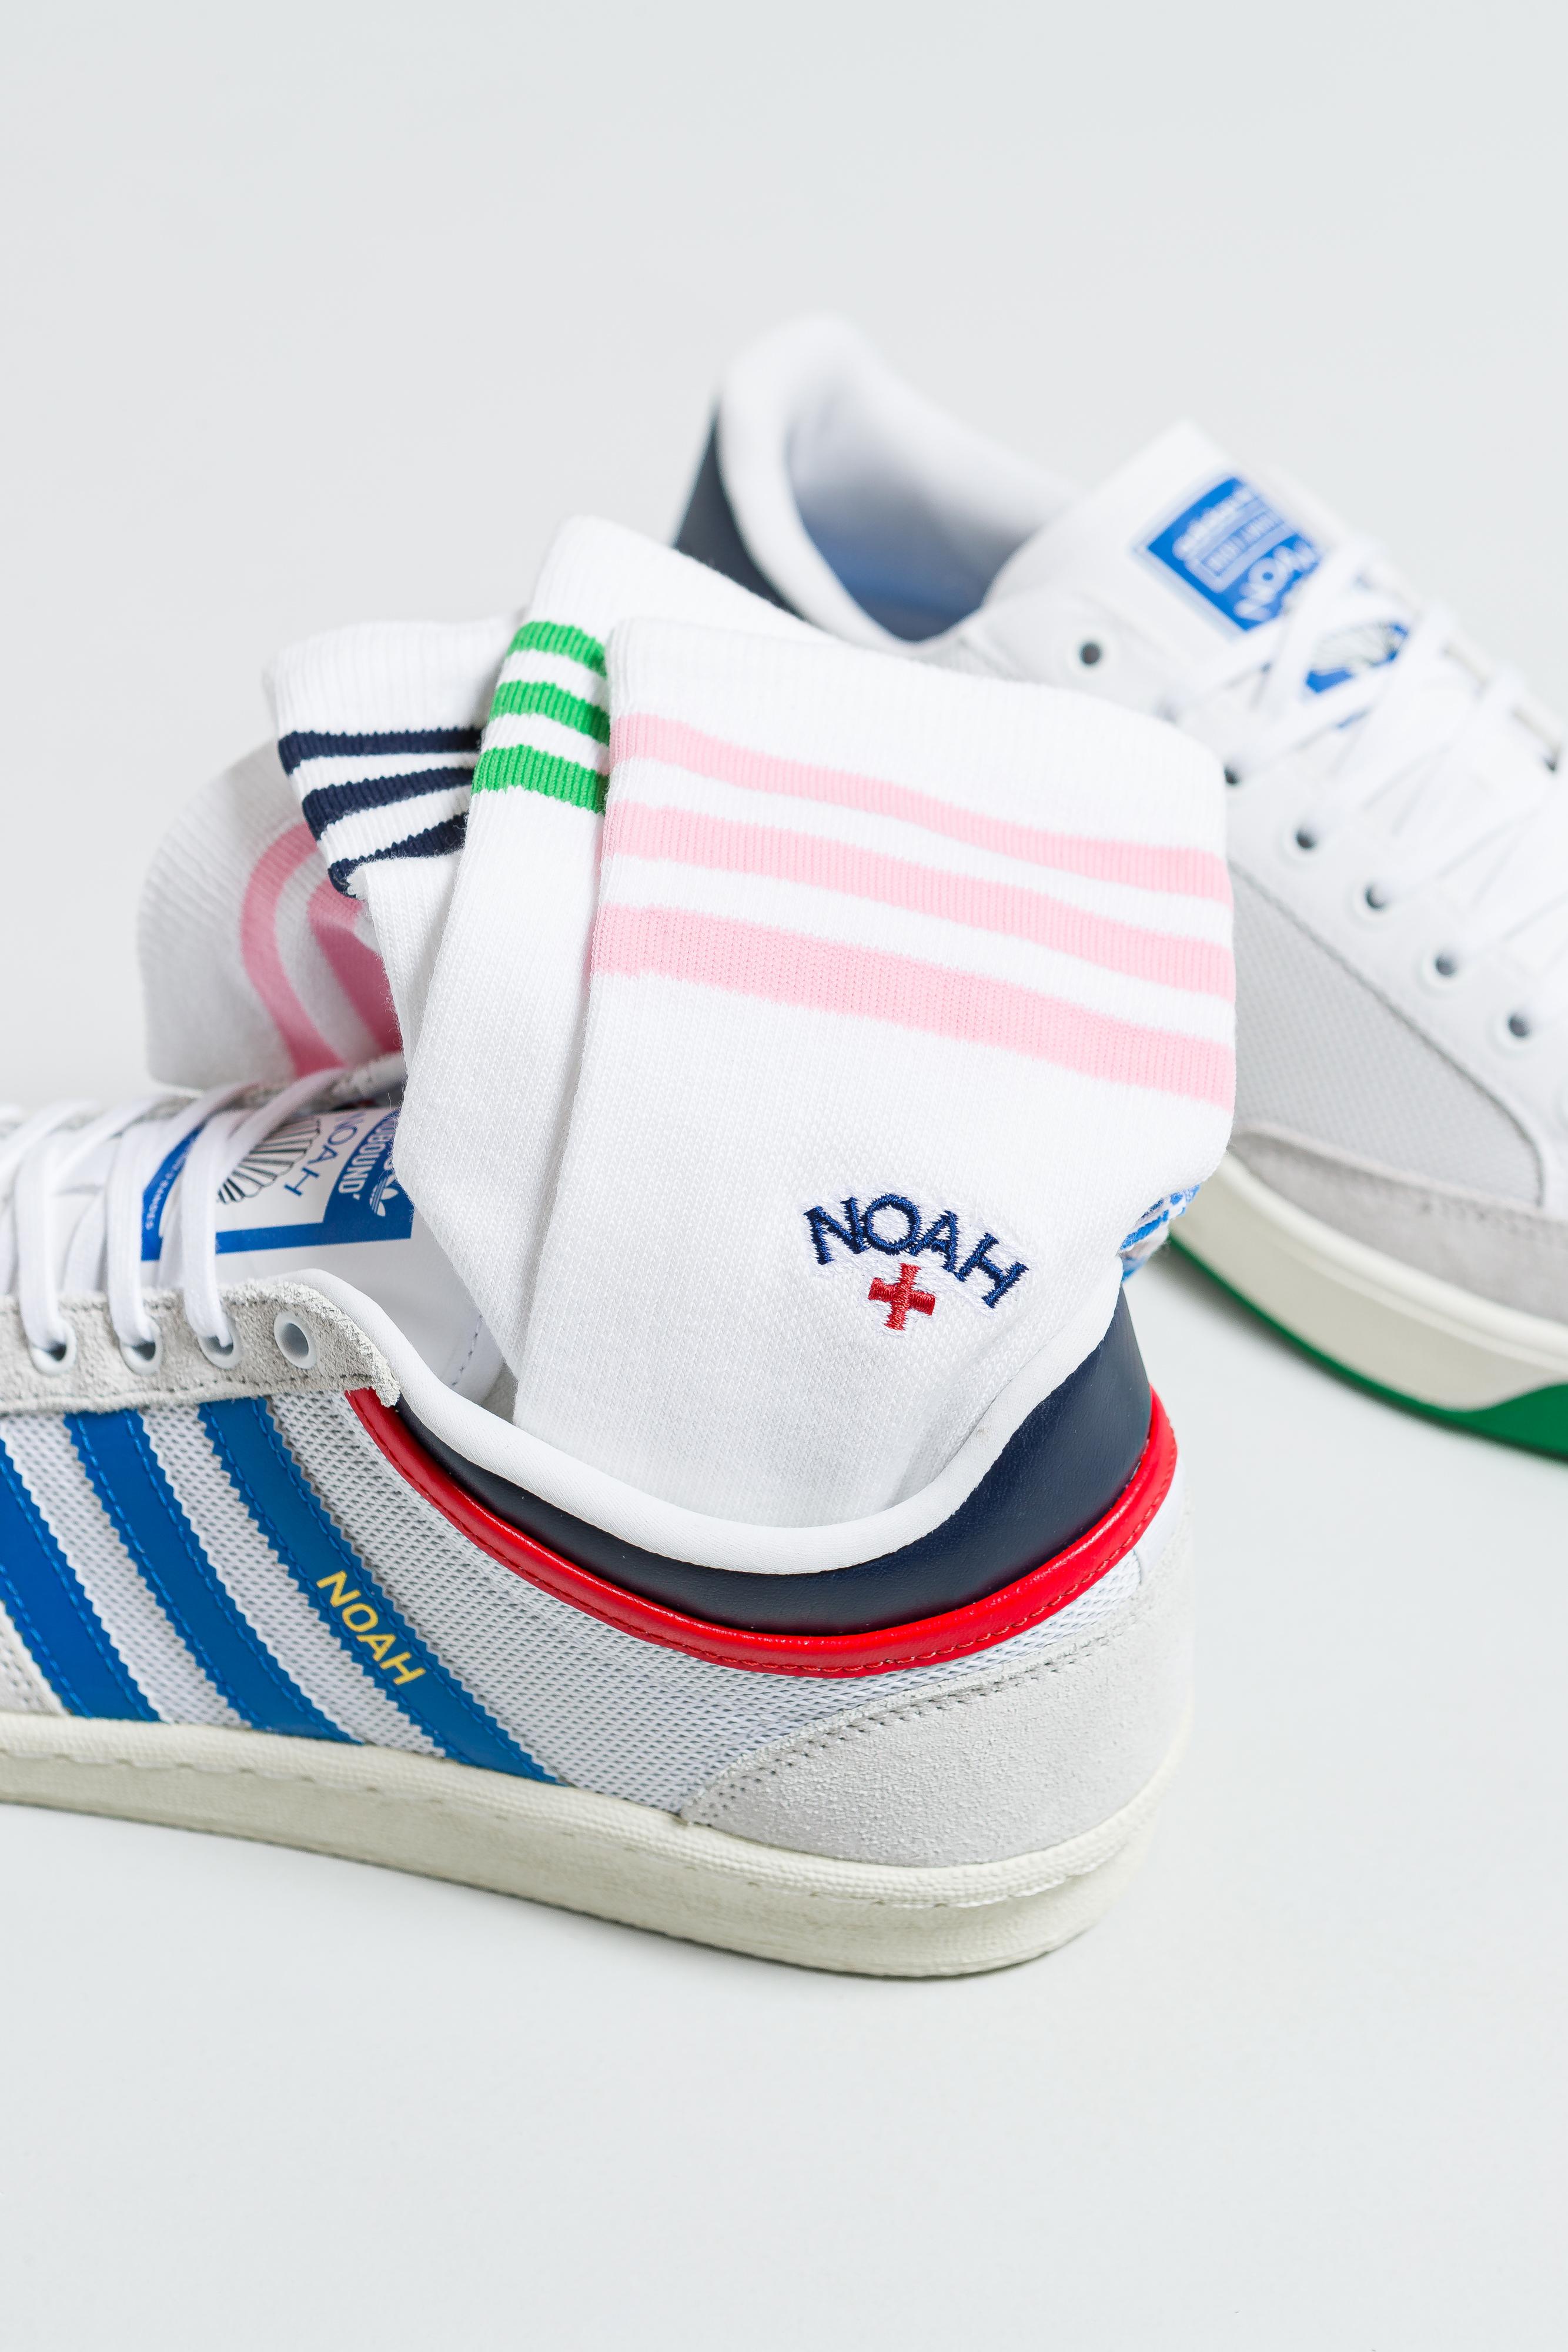 Up There Store - adidas Originals X Noah